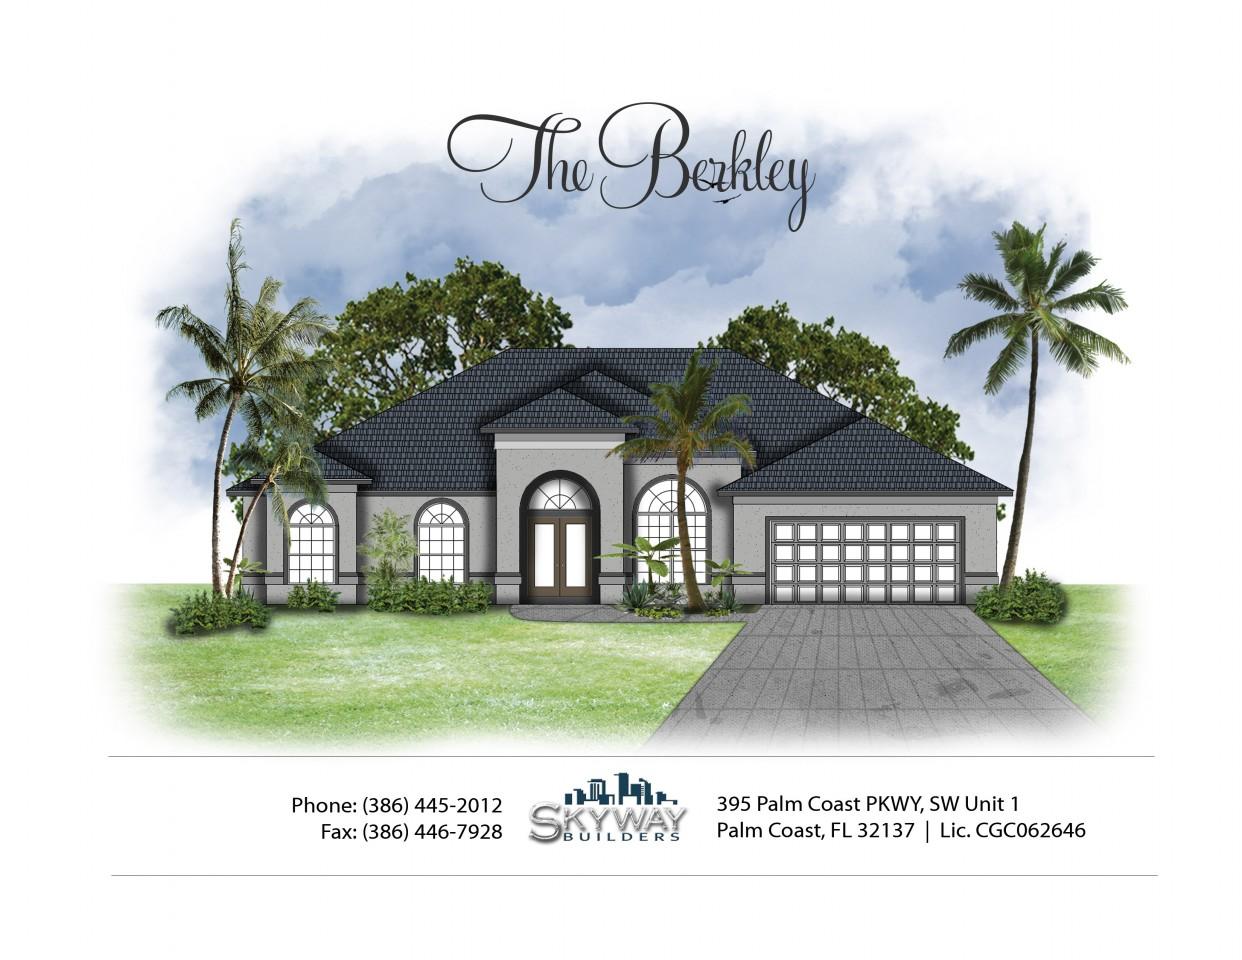 Illustrated mock up of the custom built Berkley home